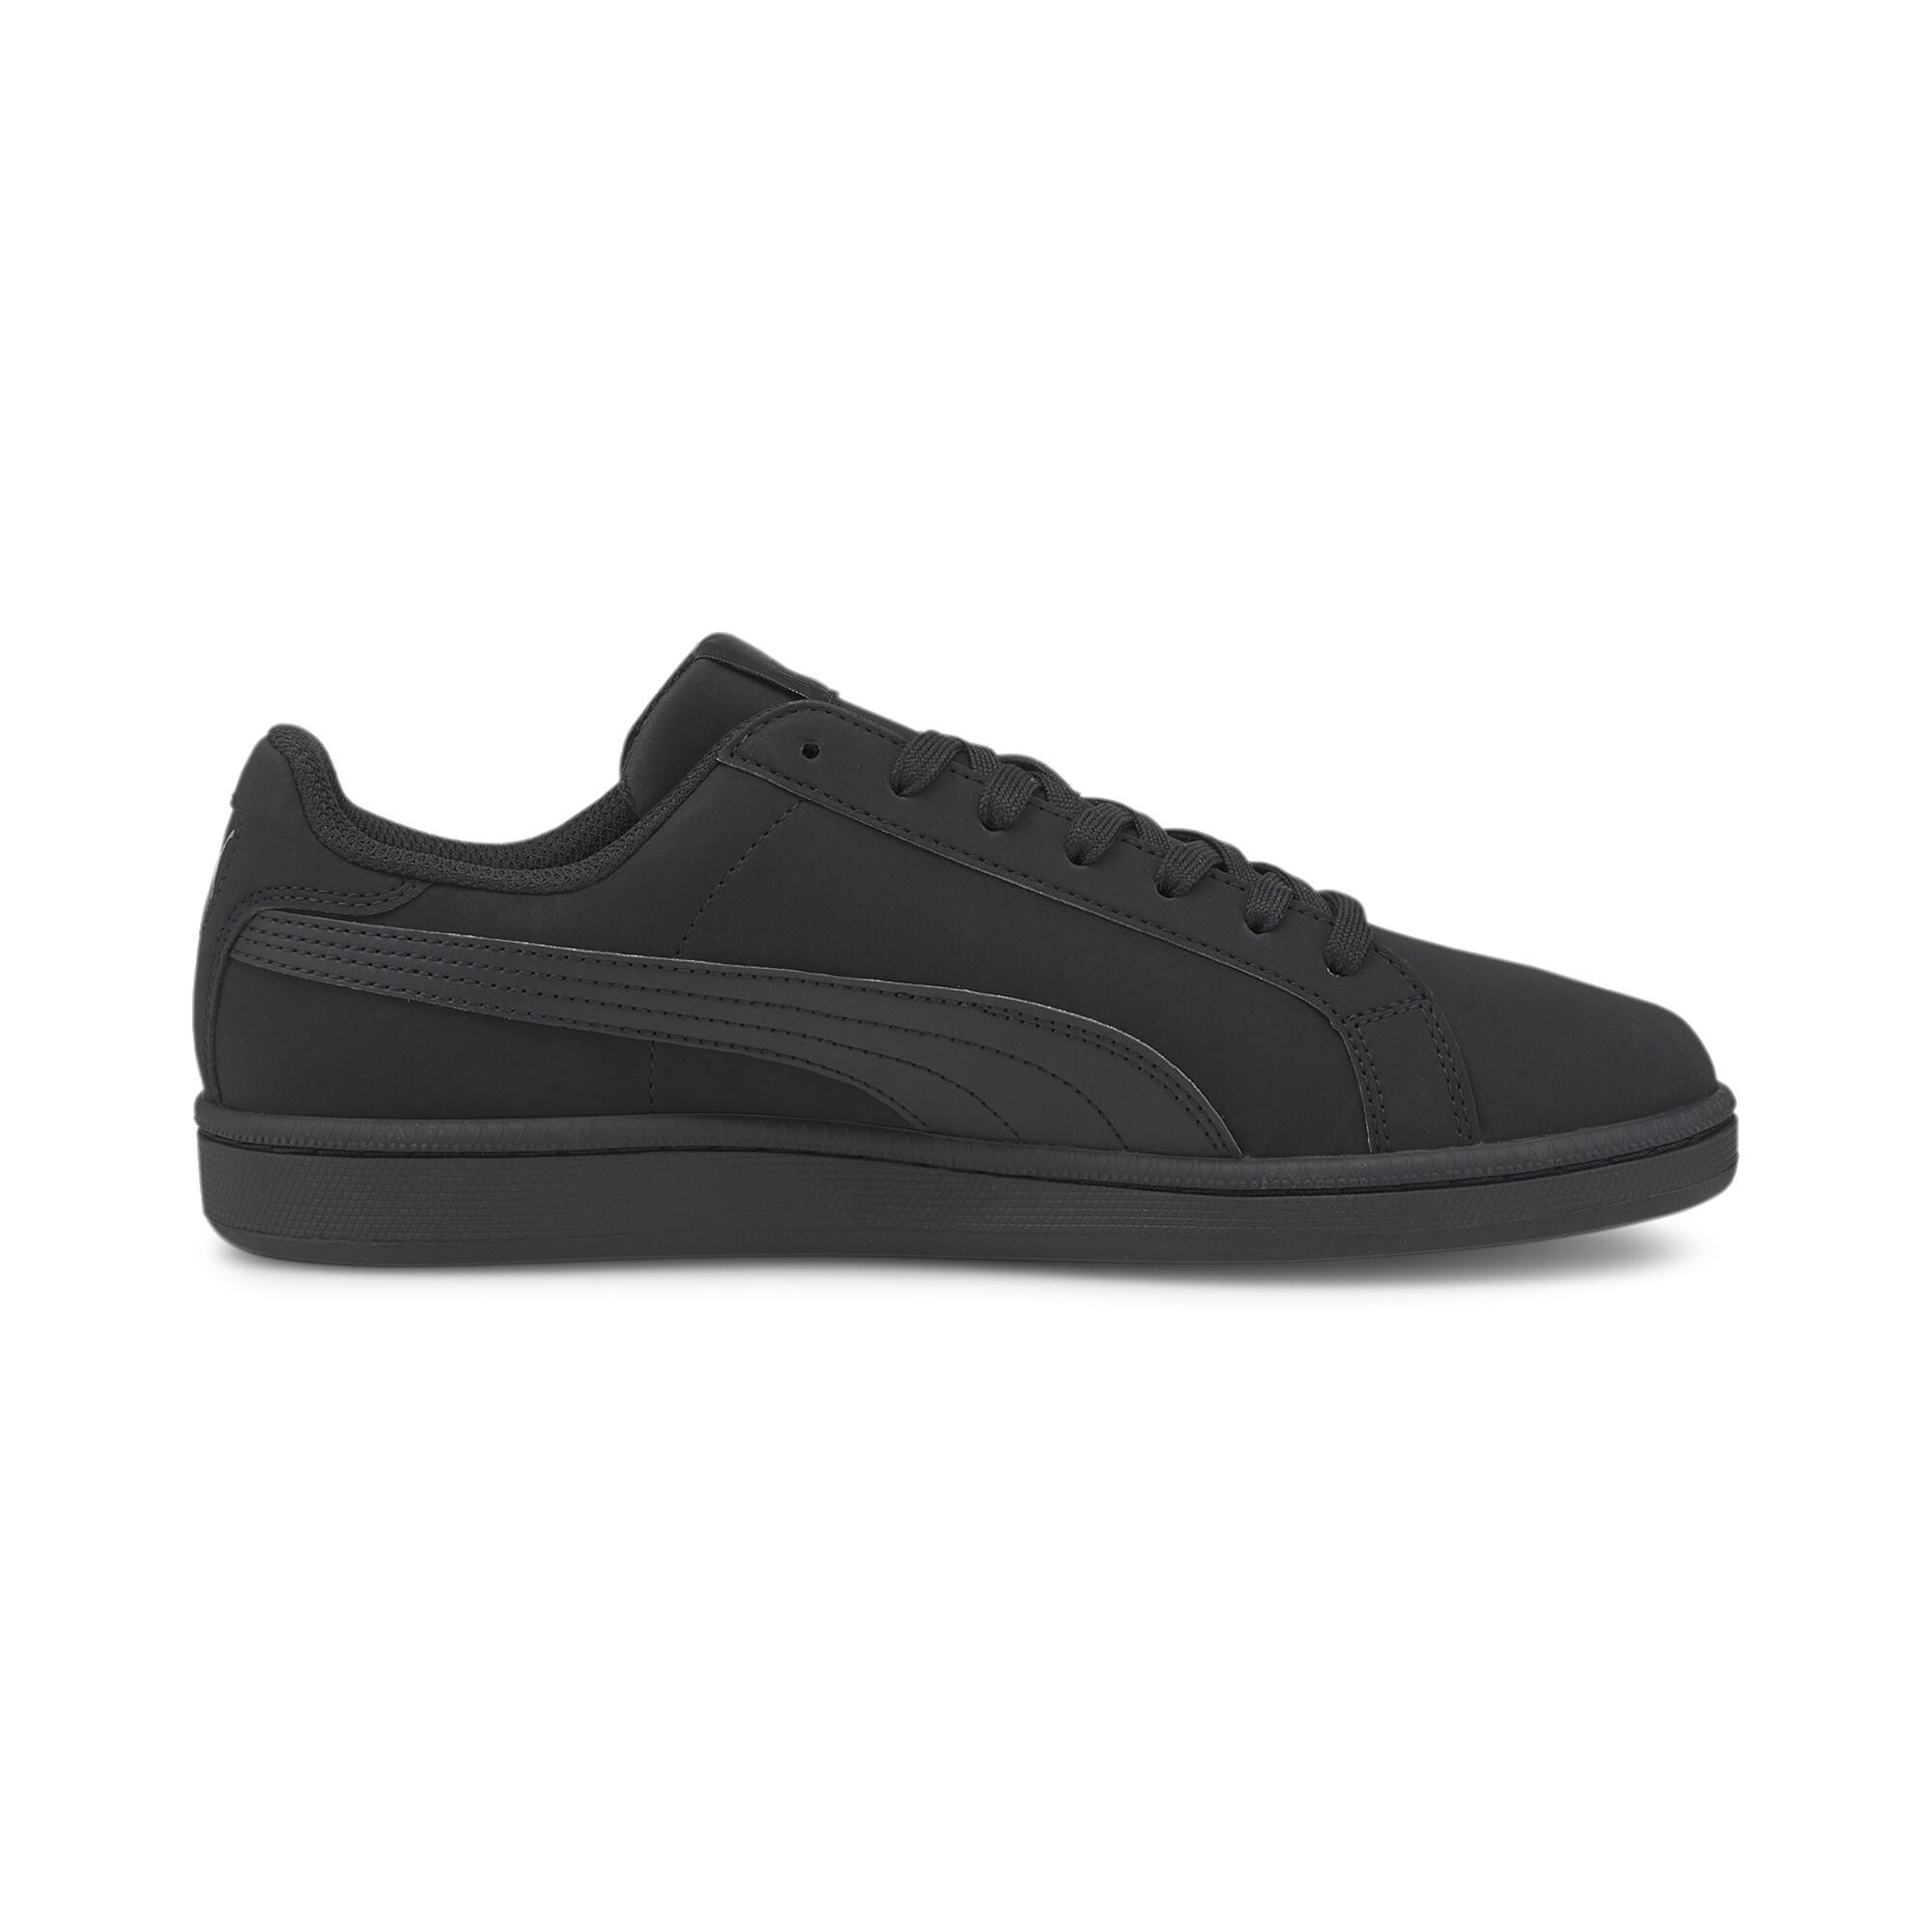 Indexbild 11 - PUMA Smash Buck Sneaker Unisex Schuhe Sport Classics Neu